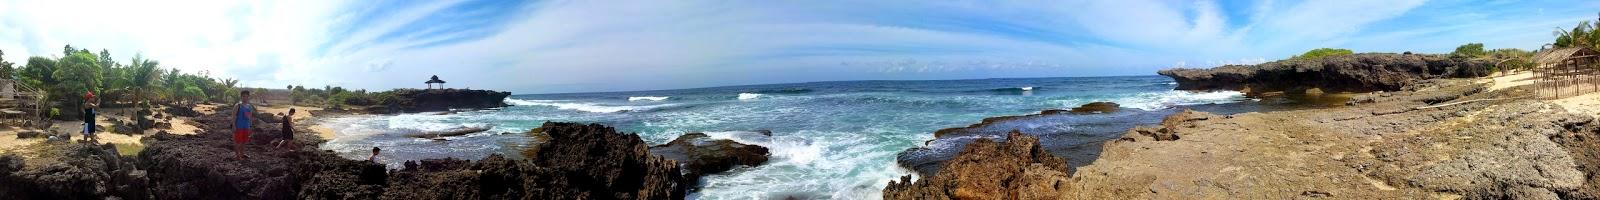 Bolinao Rock Formation Pangasinan Panorama